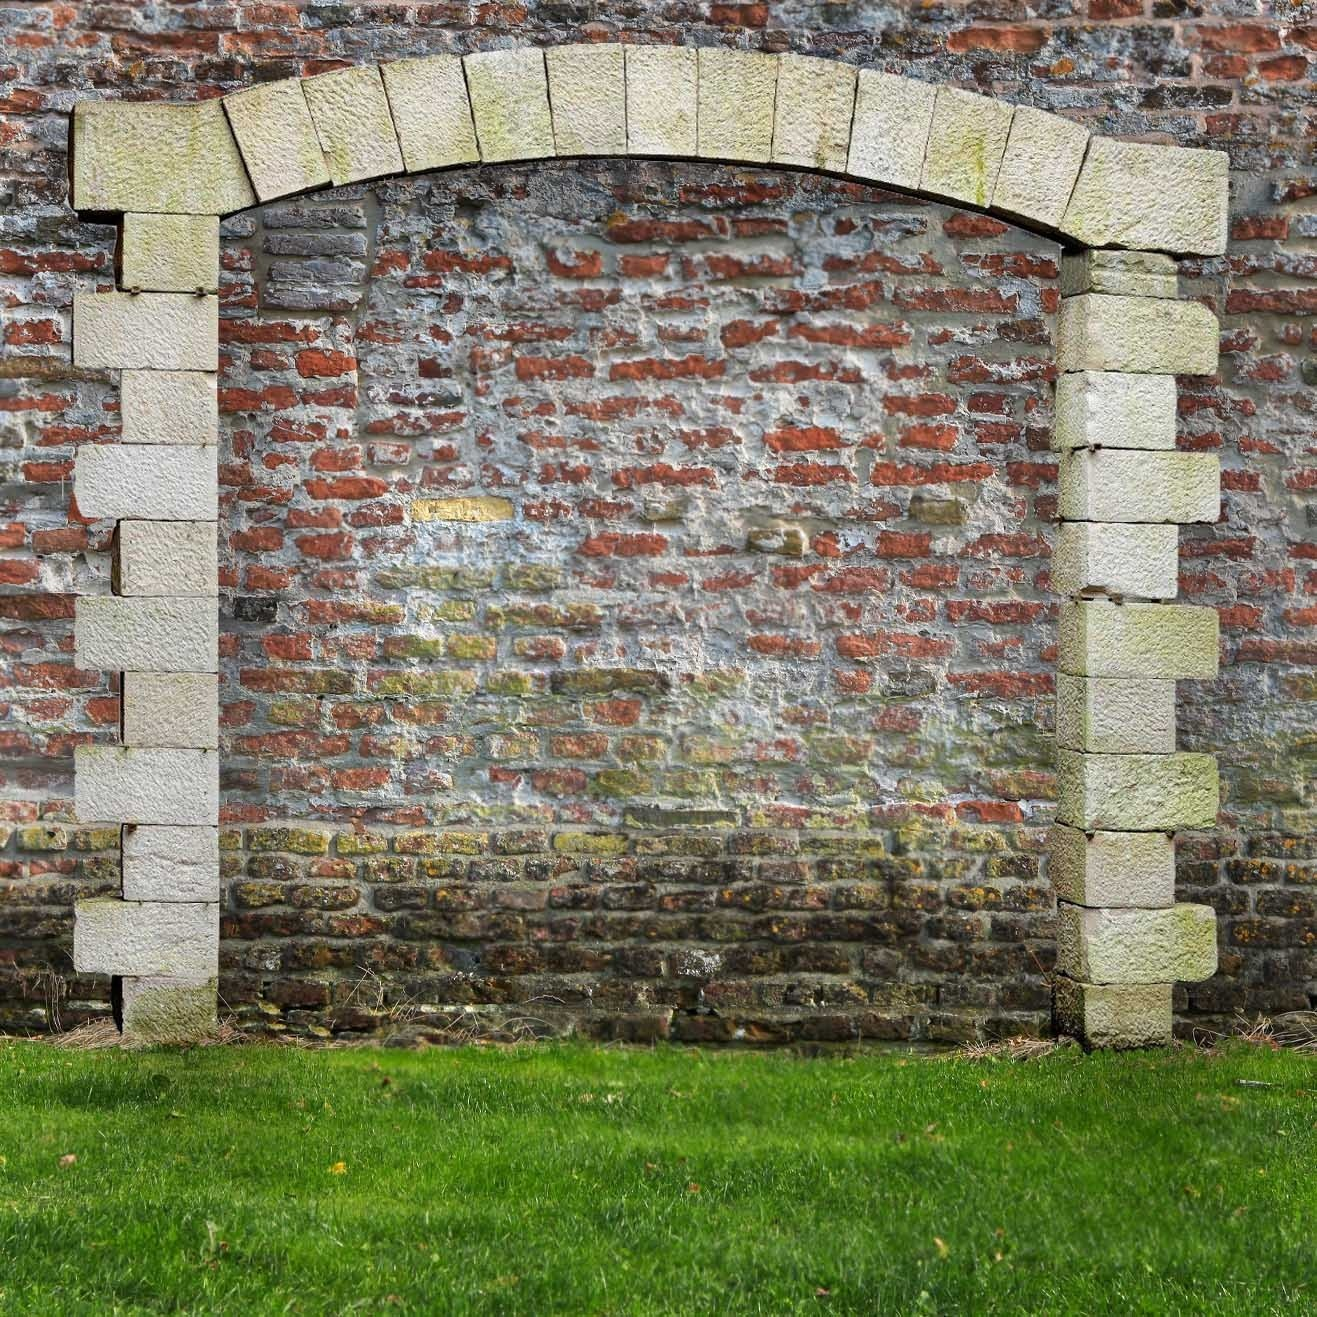 19th century sandstone arch